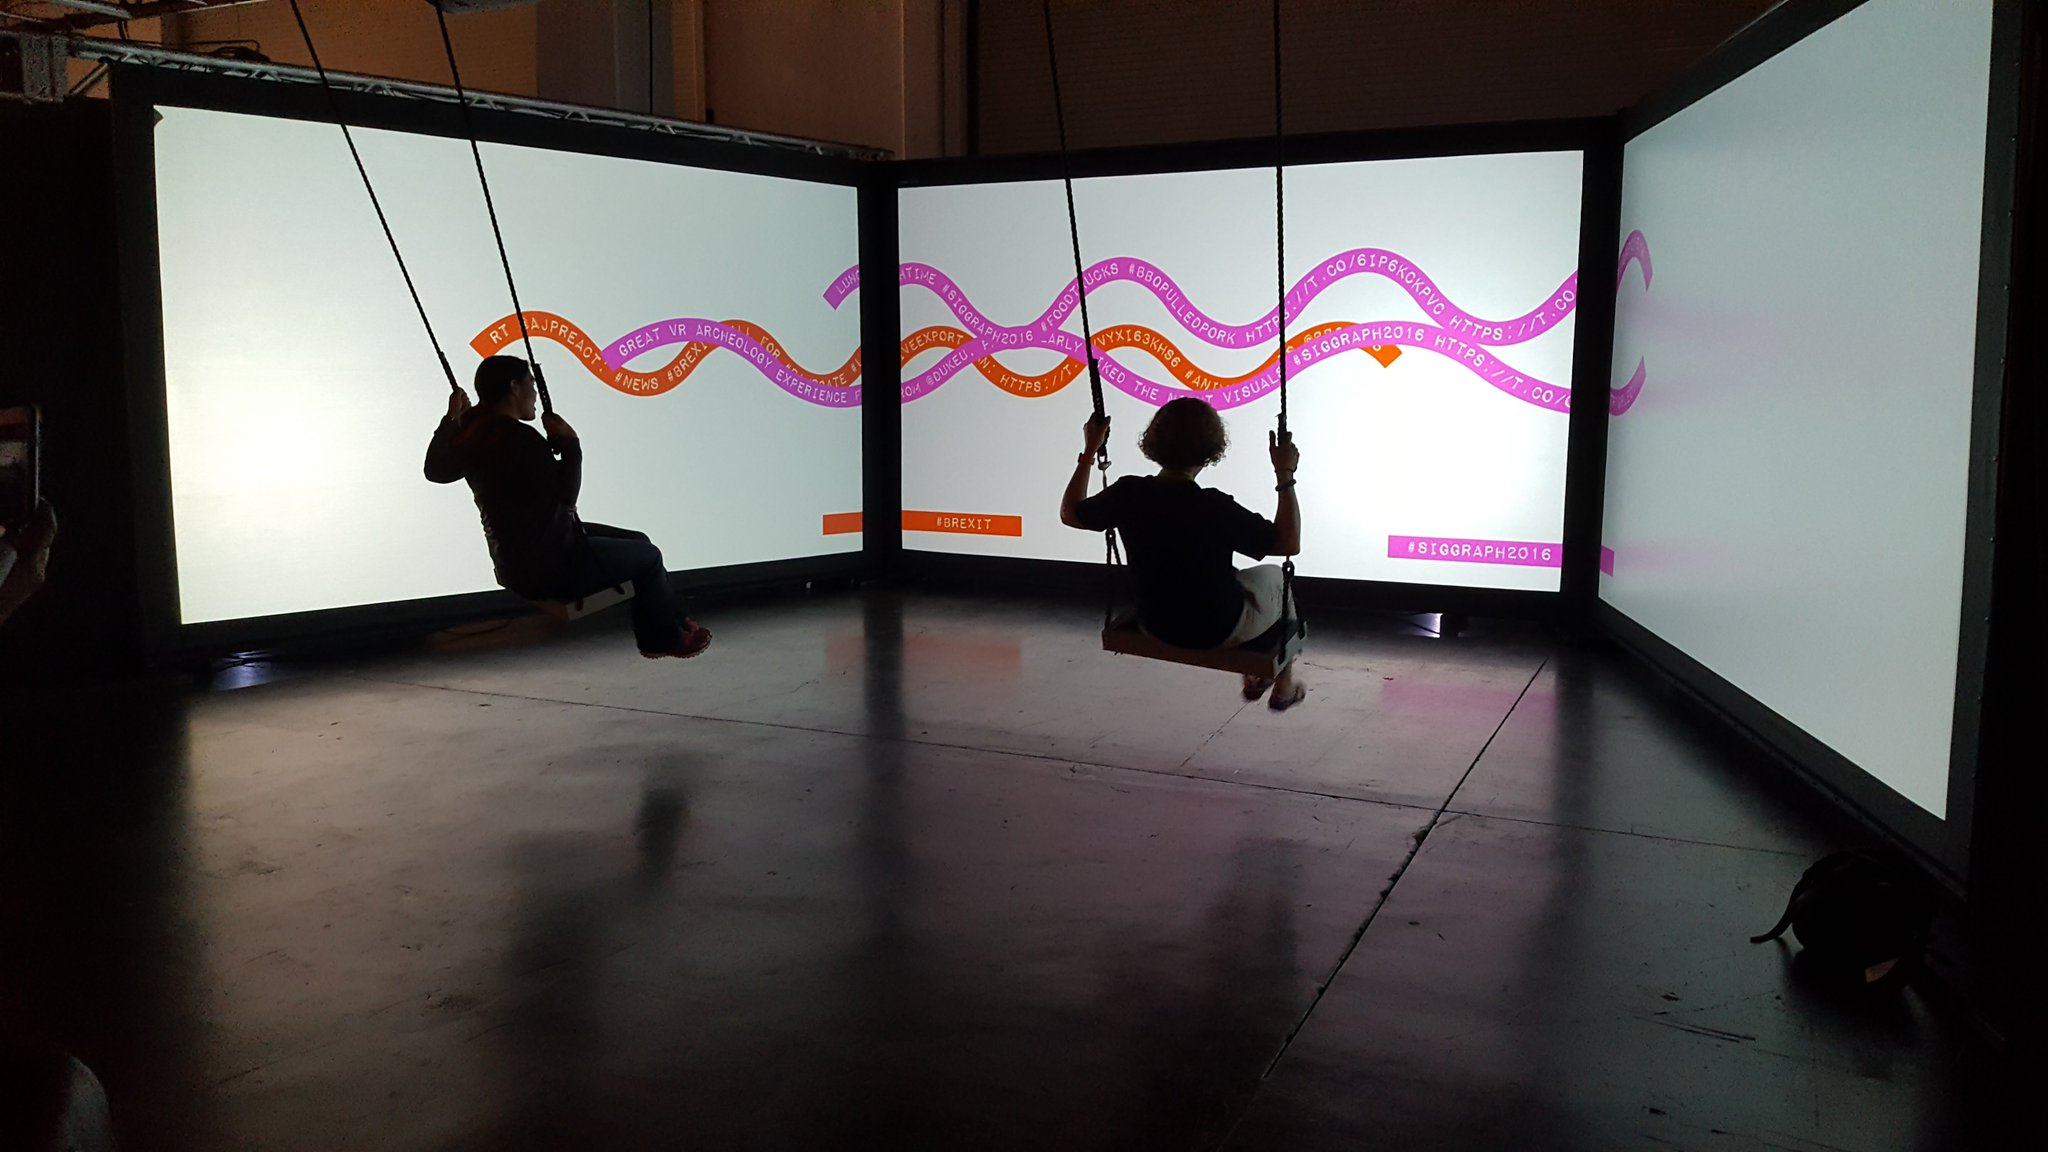 RT @vertebraeinc: Giving it a go on the #Siggraph swings.  #Lightbug #play #Siggraph2016 #interactive #VertebraeVR https://t.co/tegwNEjyHw